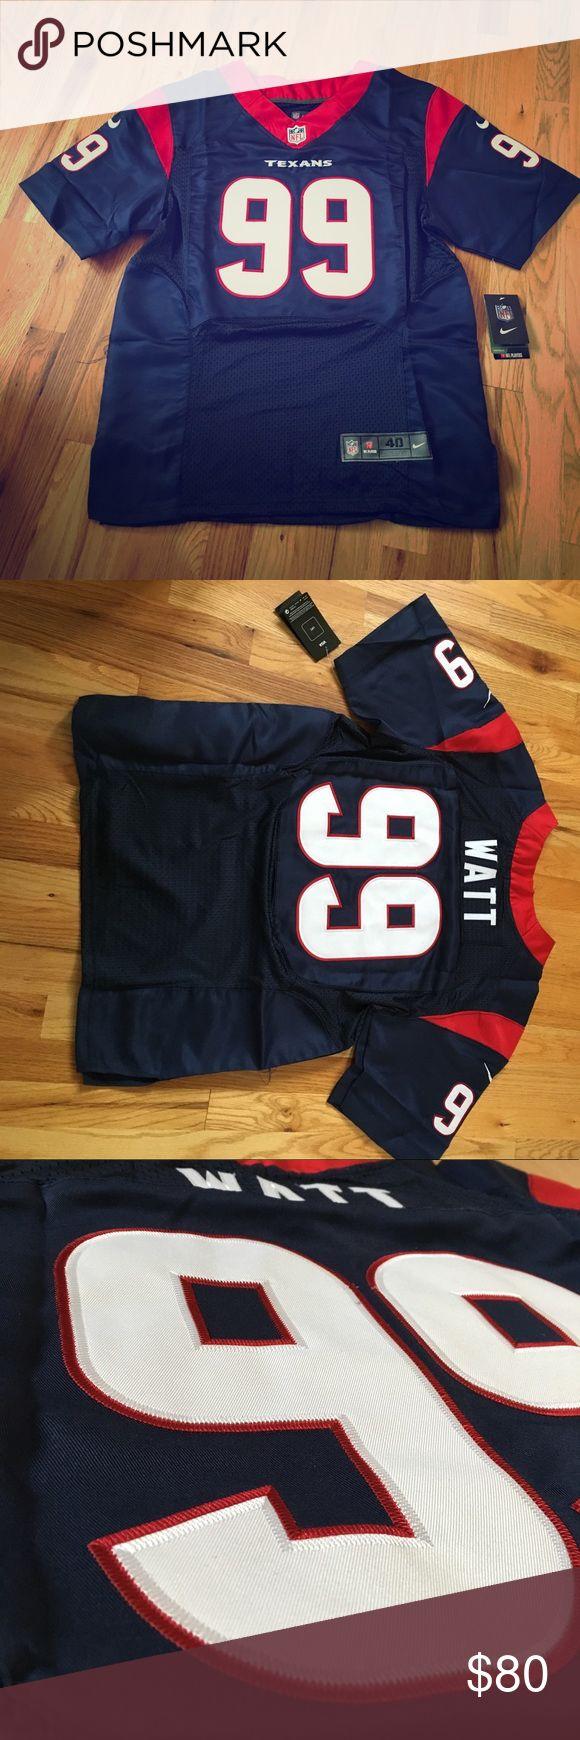 NFL Authentic JJ Watt football jersey SIZE 40 Authentic on field JJ Watt #99 Houston Texans Jersey Nike Other